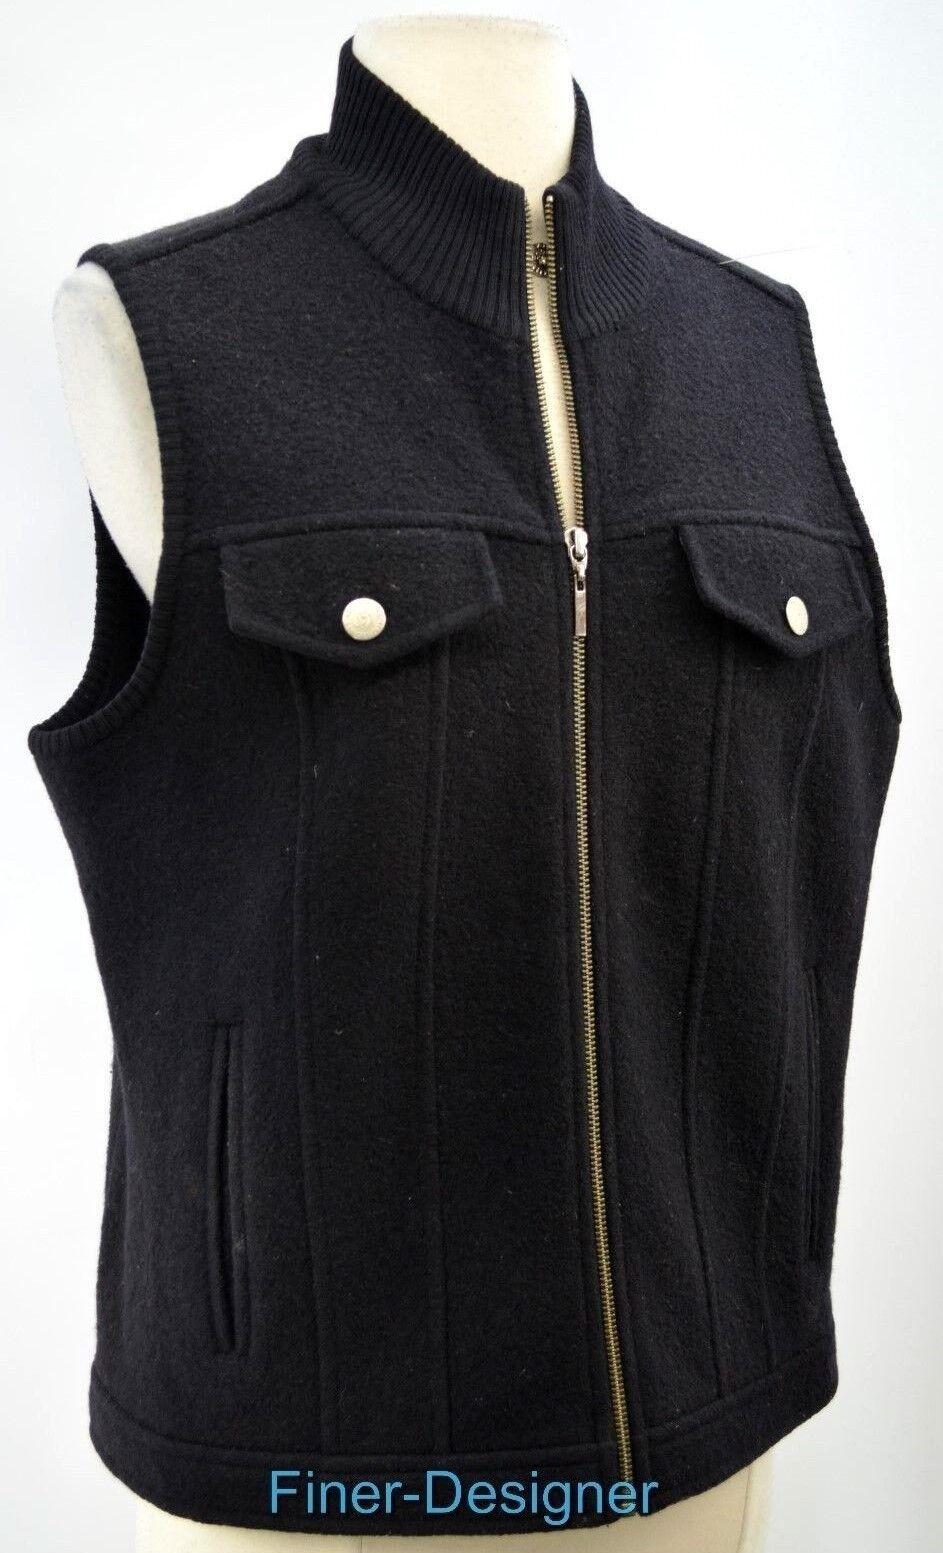 REAL CLOTHES SAKS FIFTH AVENUE Vest knit boiled wool sleeveless sleeveless sleeveless zip coat M VTG 5ad42d